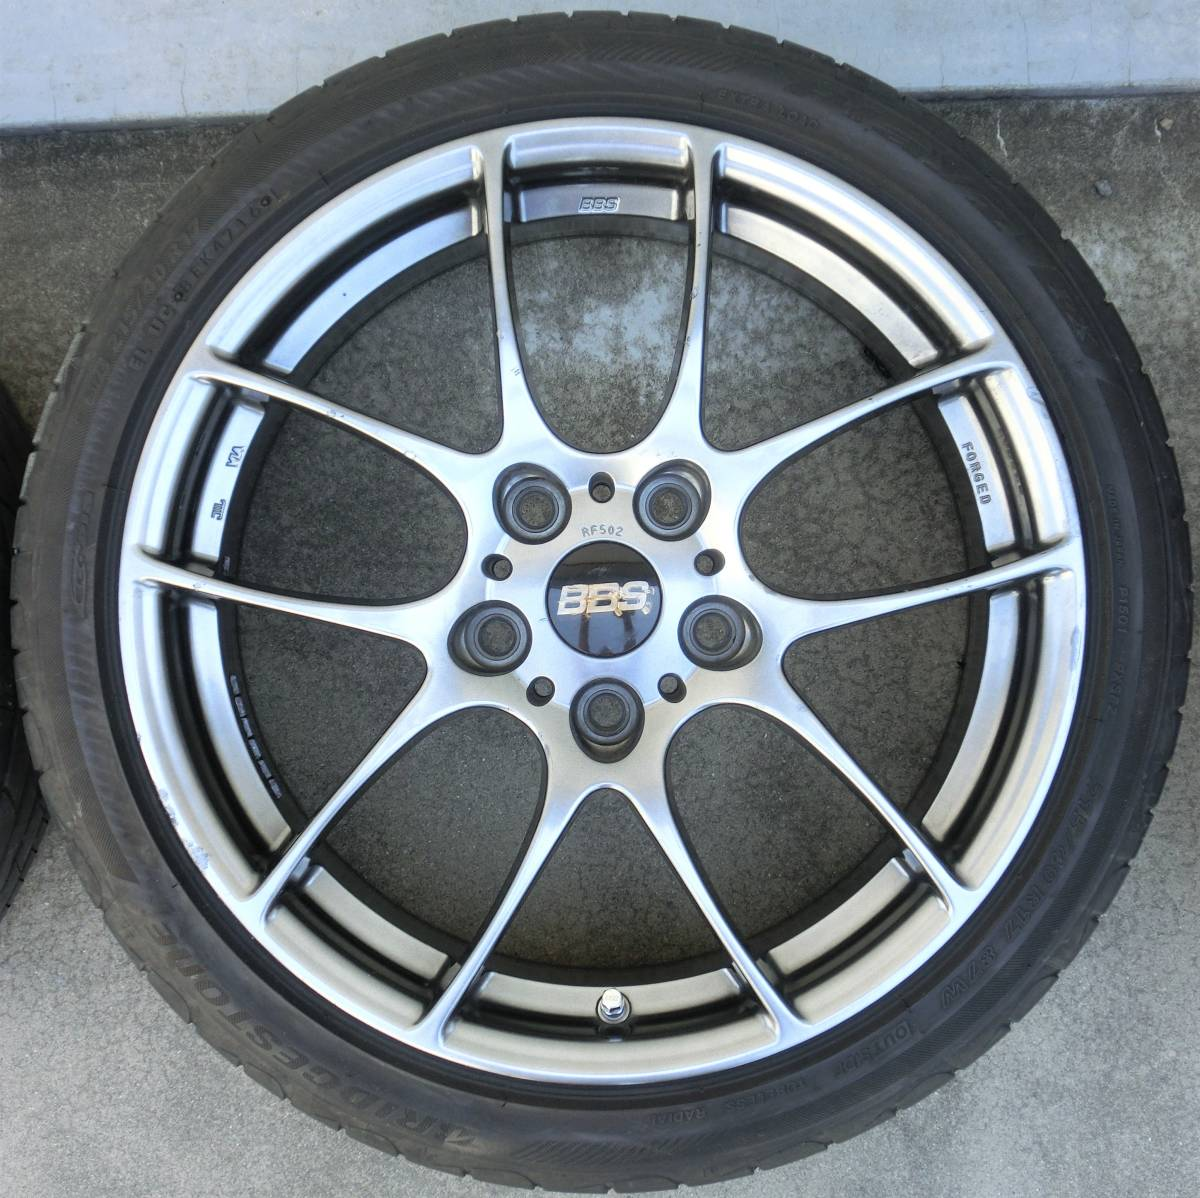 BBS RF 17x7.0J+50 114.3 5H RF502 C-HR ヴェゼル スイフト CR-Z ストリーム CX-3 EP3シビック タイプR RG-R RS-GT レイズCE28N等_画像5